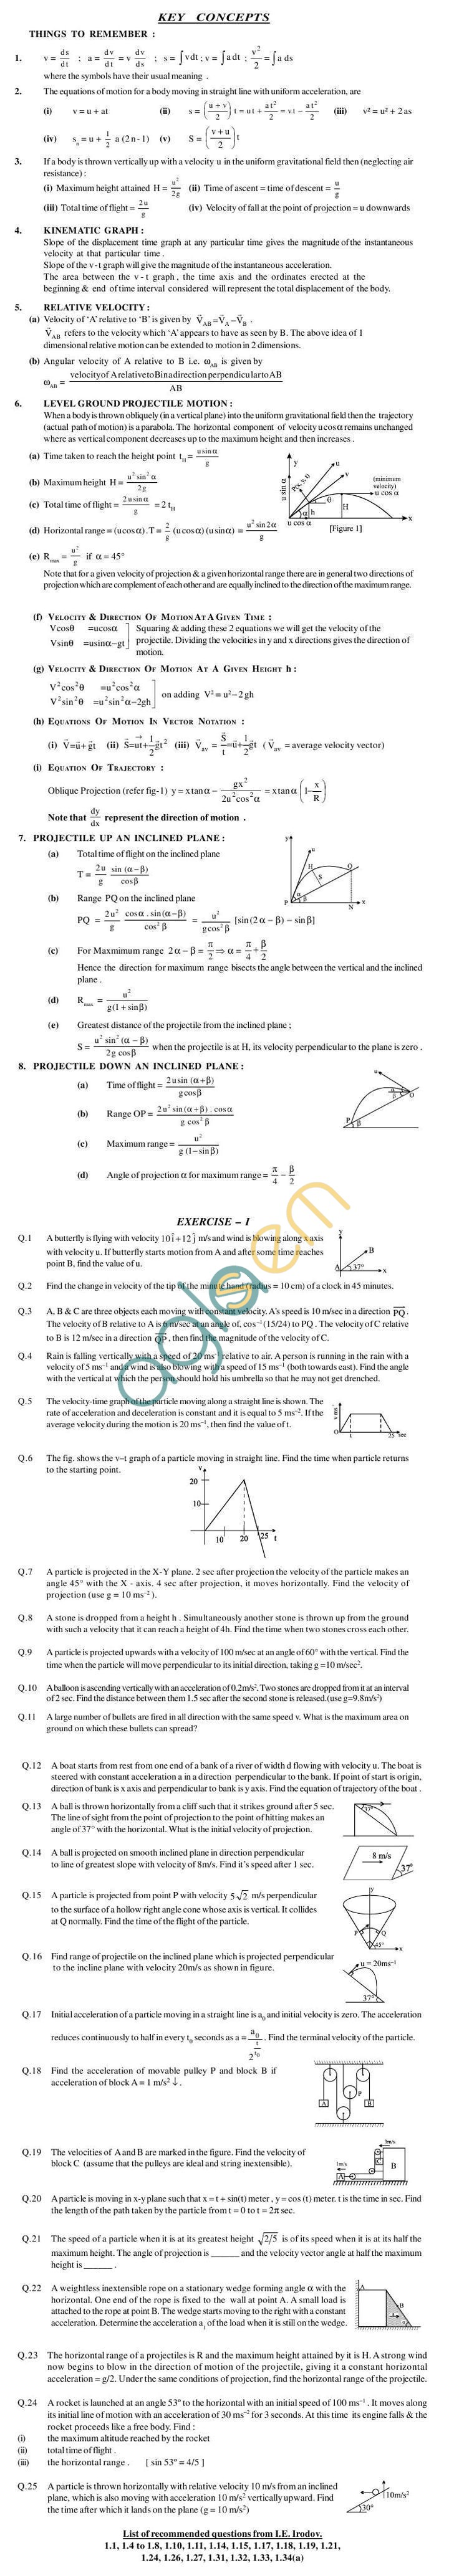 Physics Study Material - Kinematics